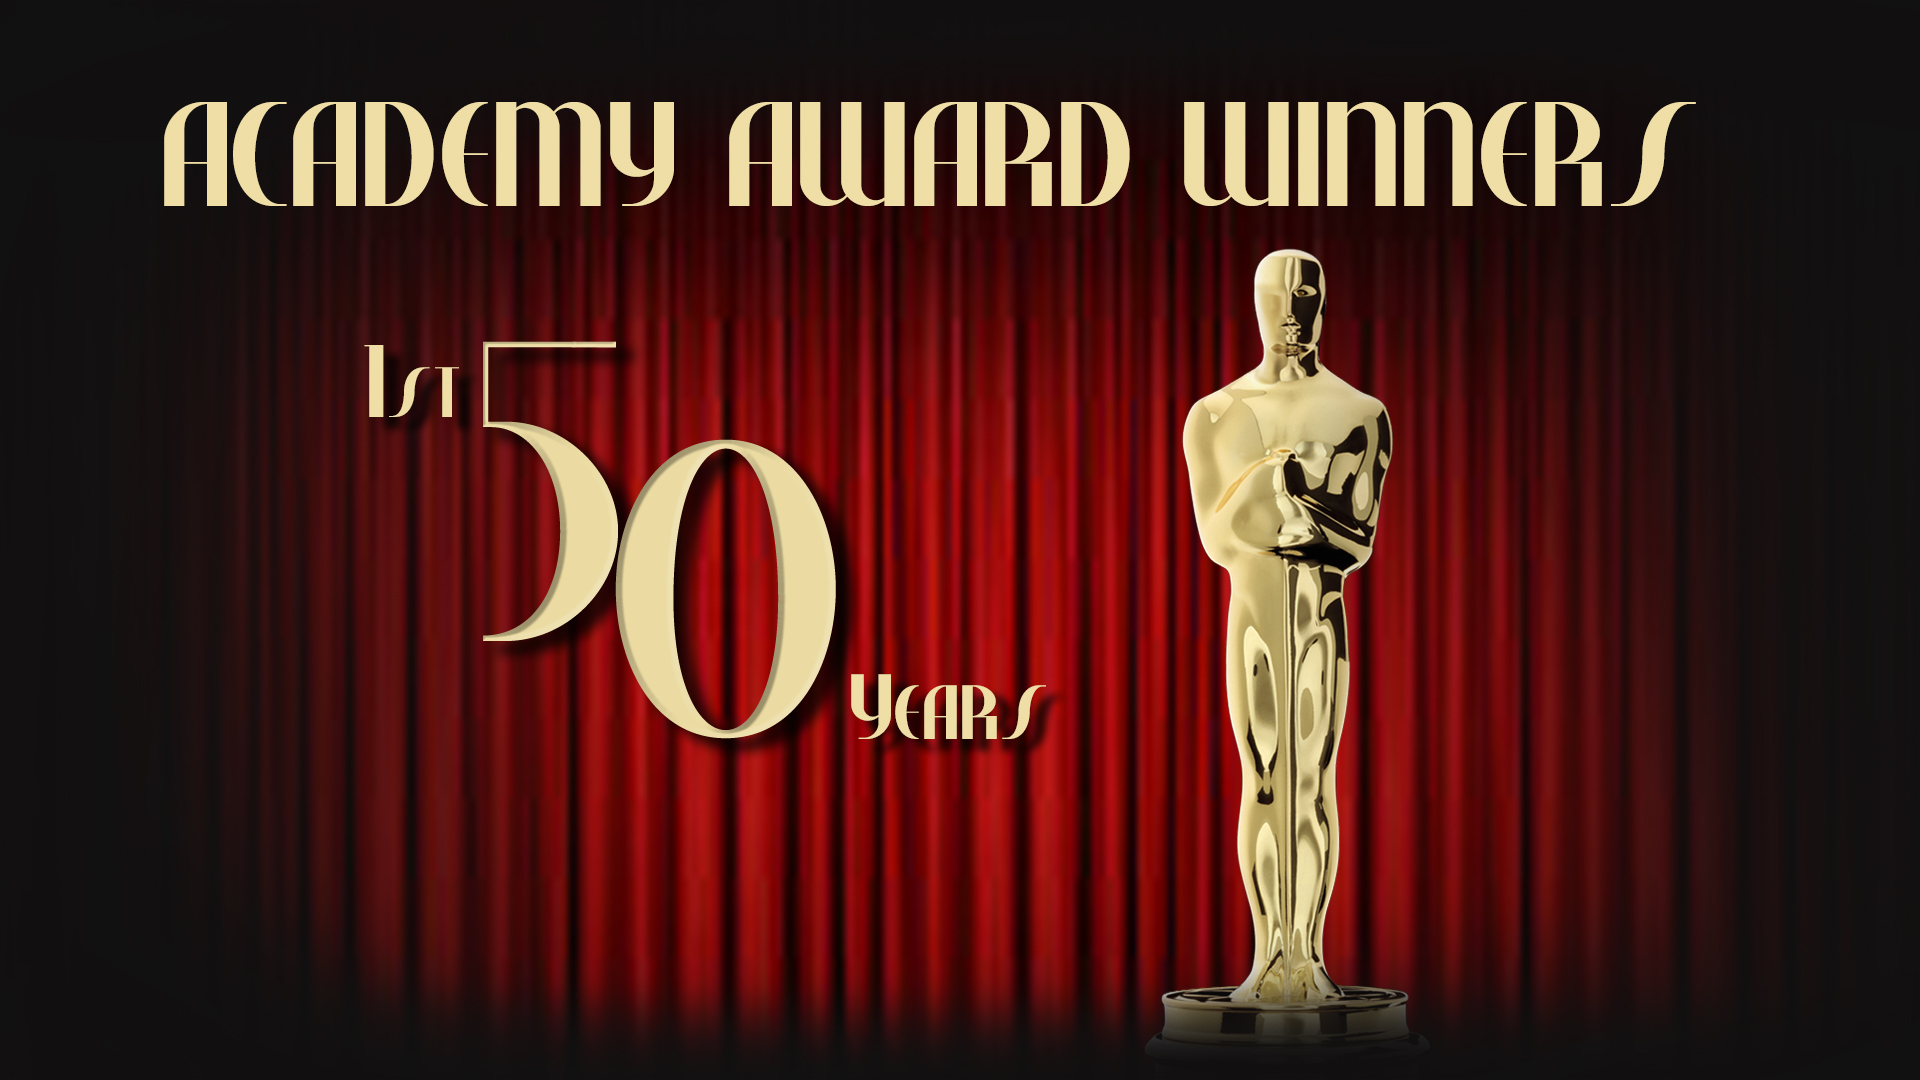 Academy Award Winners: The First 50 Years